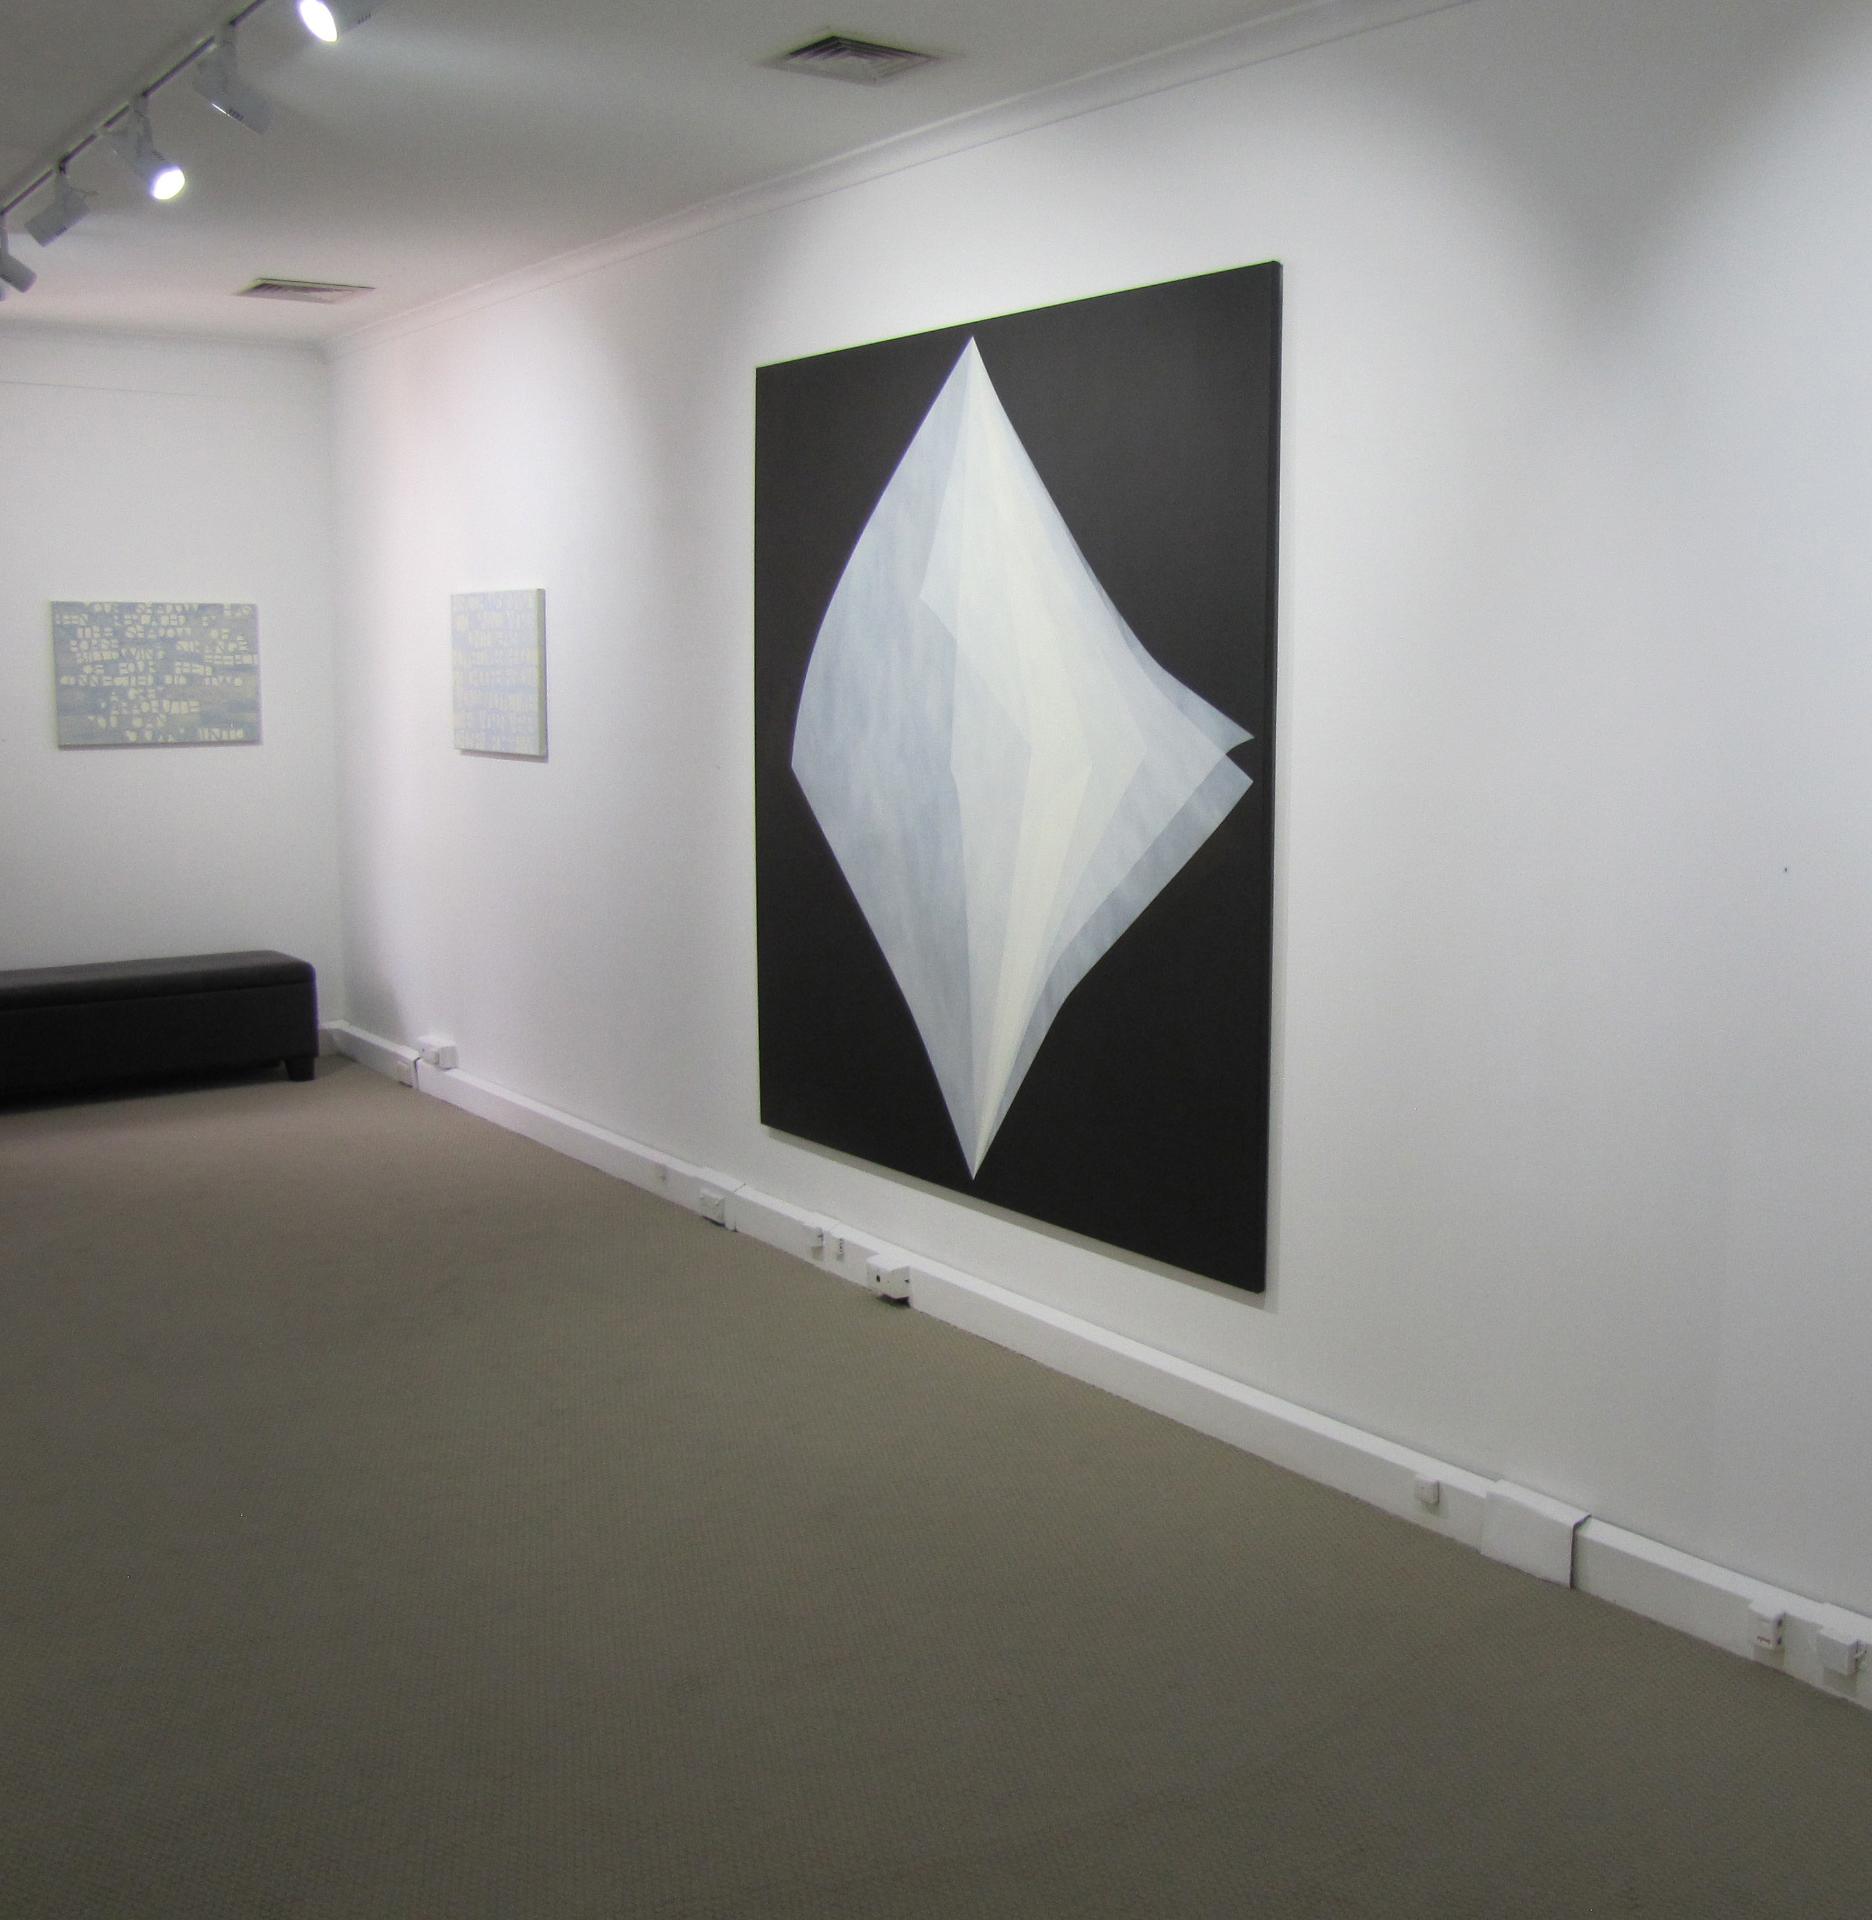 NSG. Snowball 2 exhibition. Exhibition views 6.jpg